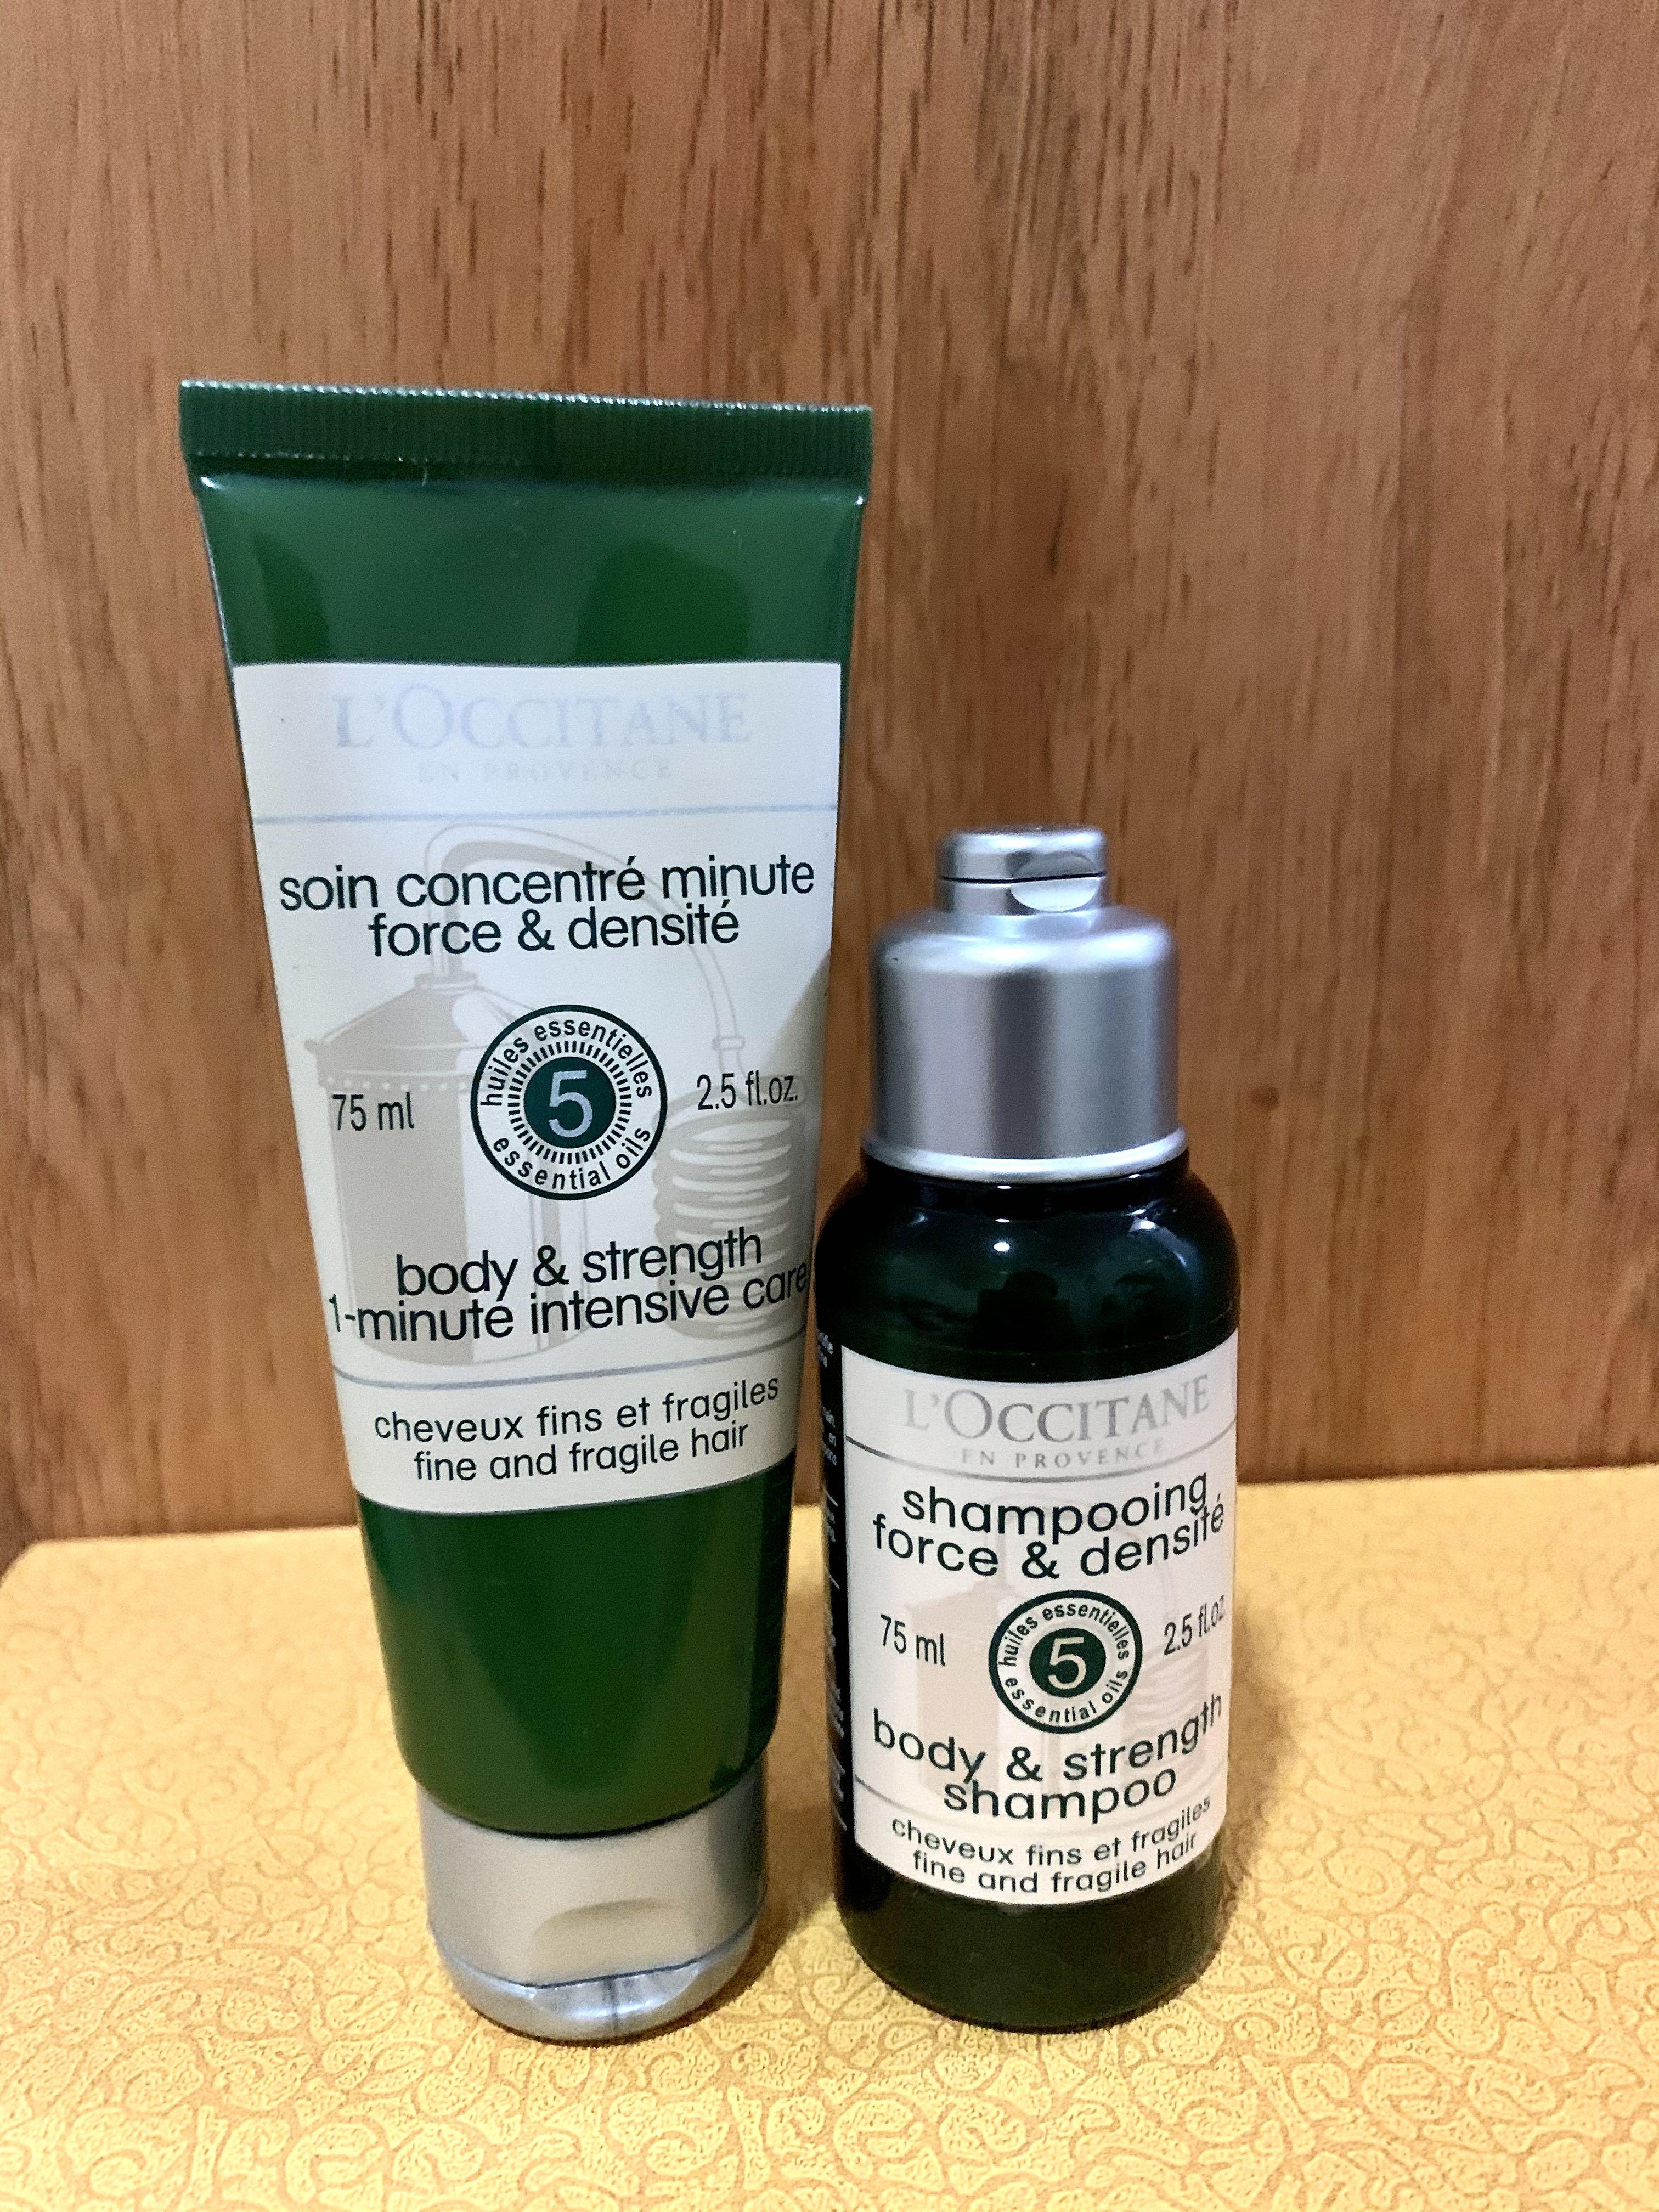 L'Occitane Body and Strength Shampoo